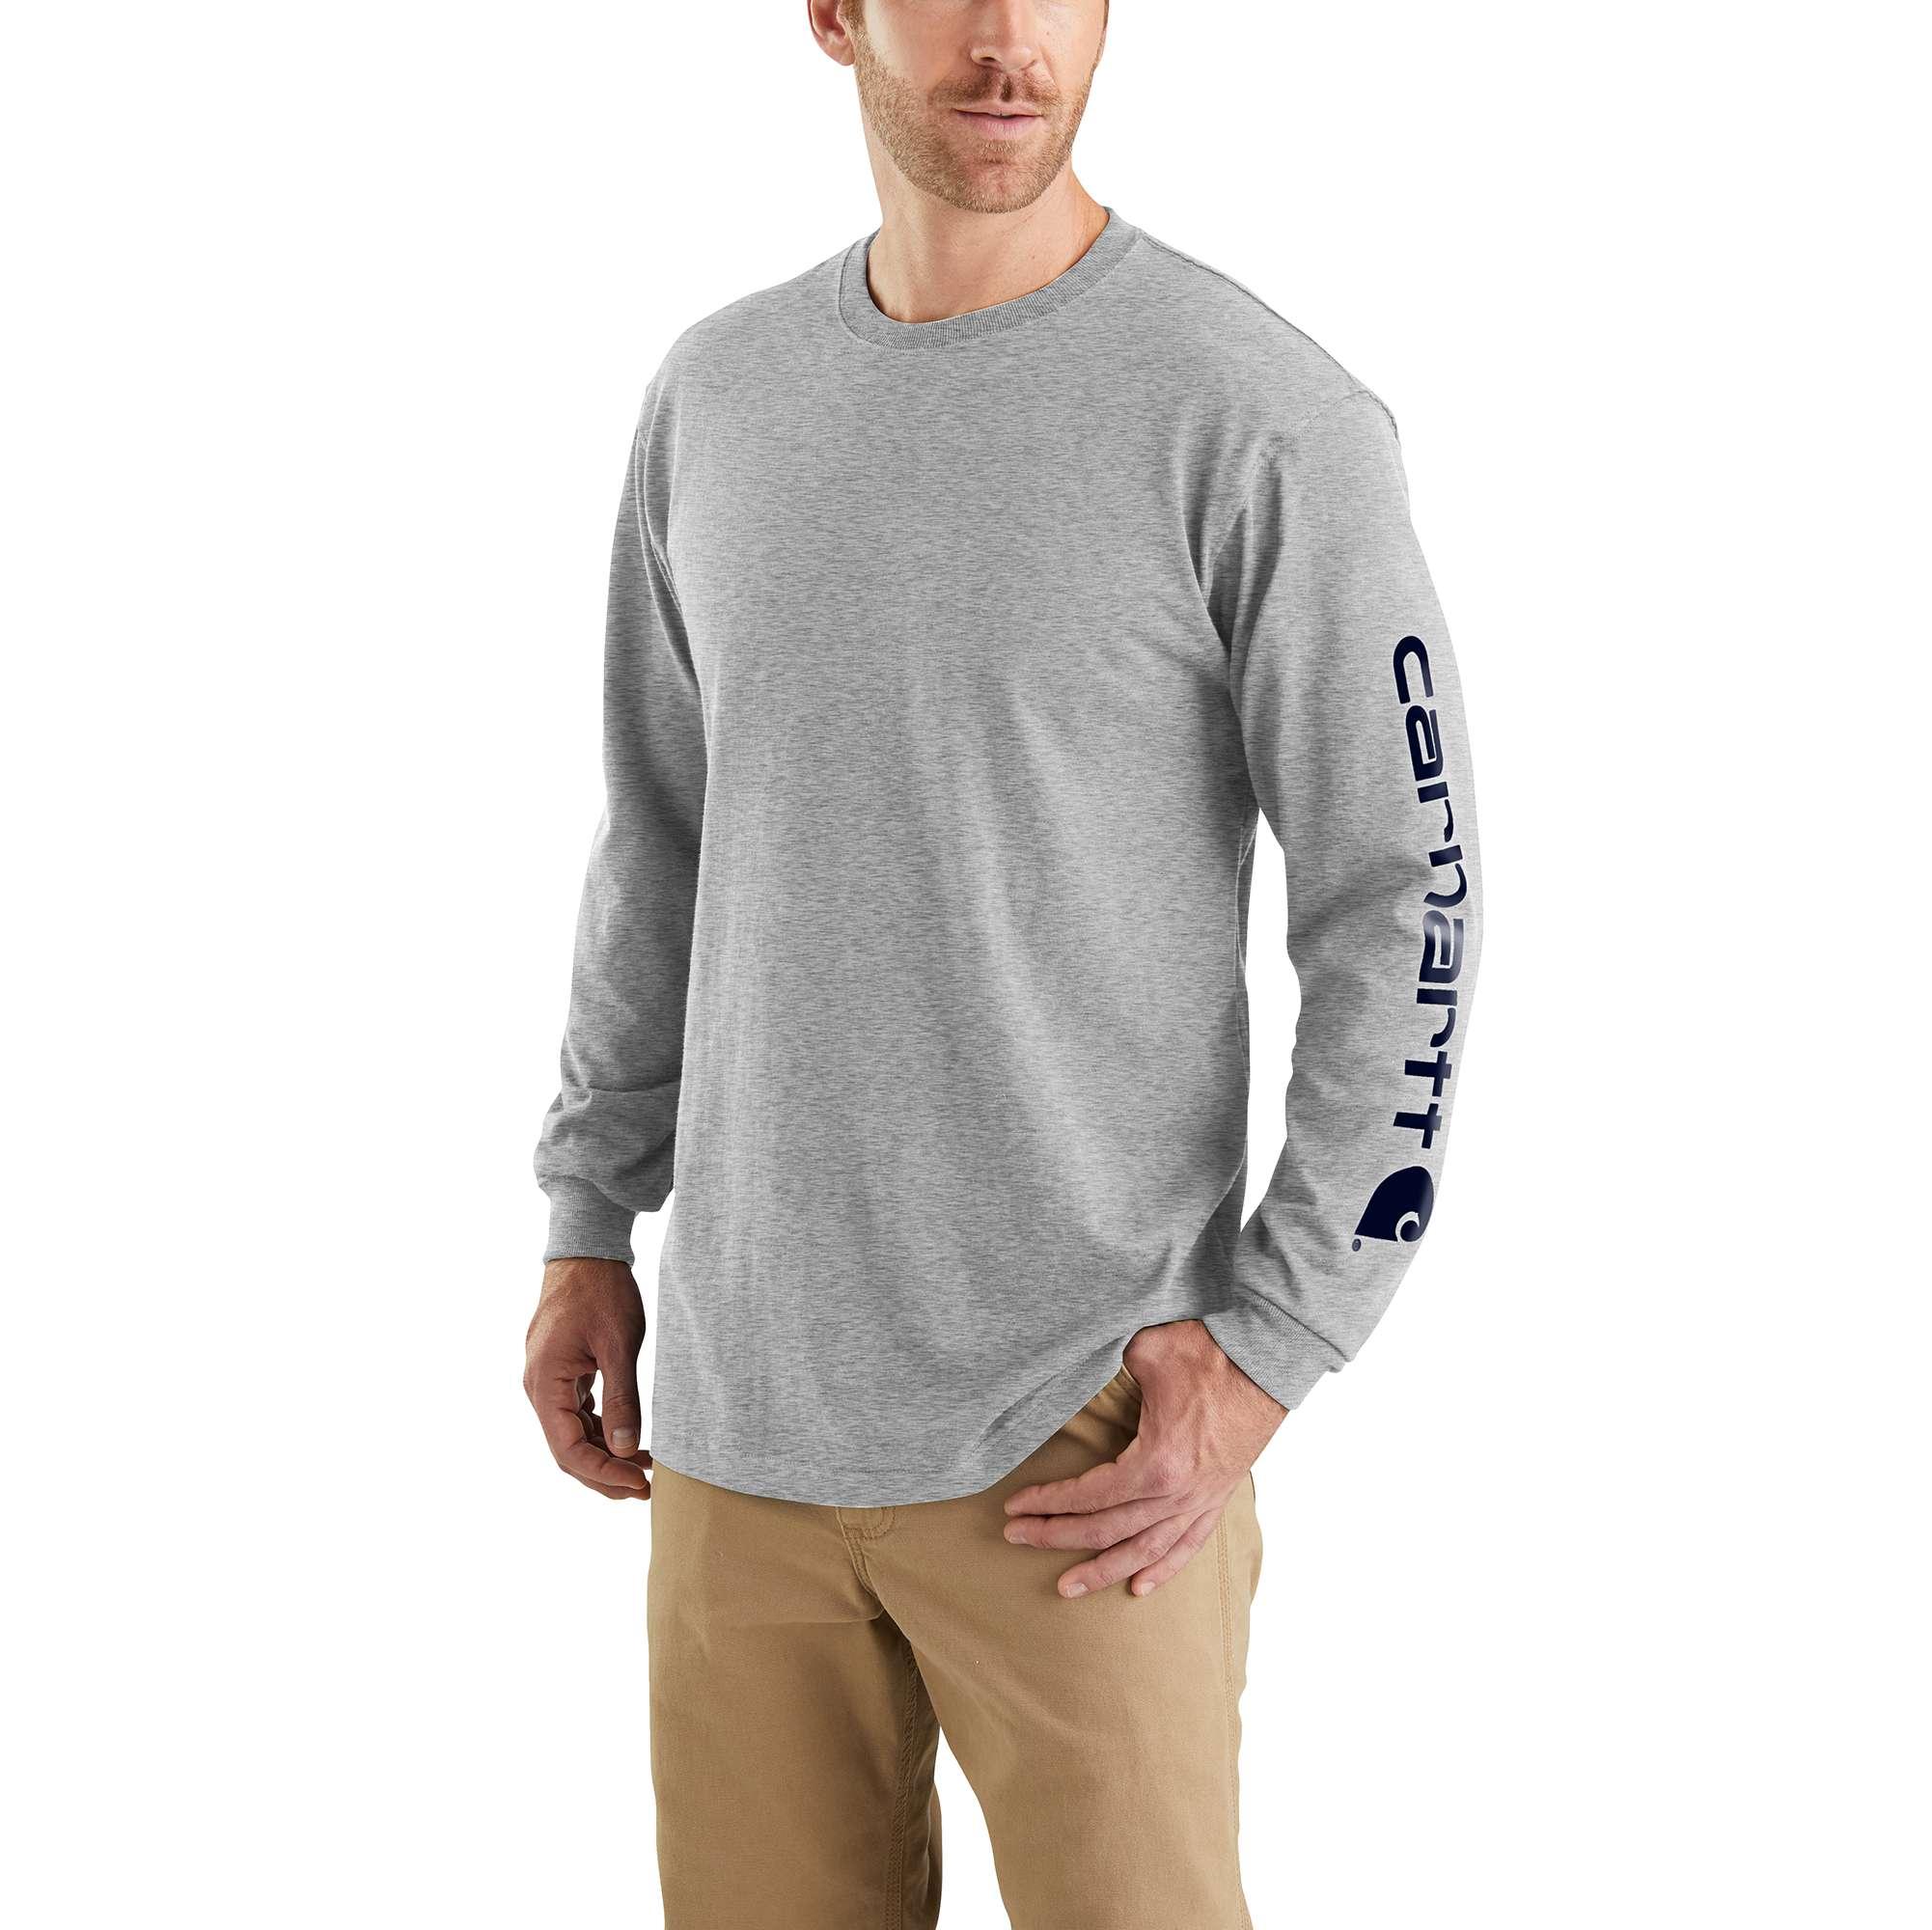 Men's Big & Tall Signature-Sleeve Logo Long-Sleeve T-Shirt, Heather Gray, swatch